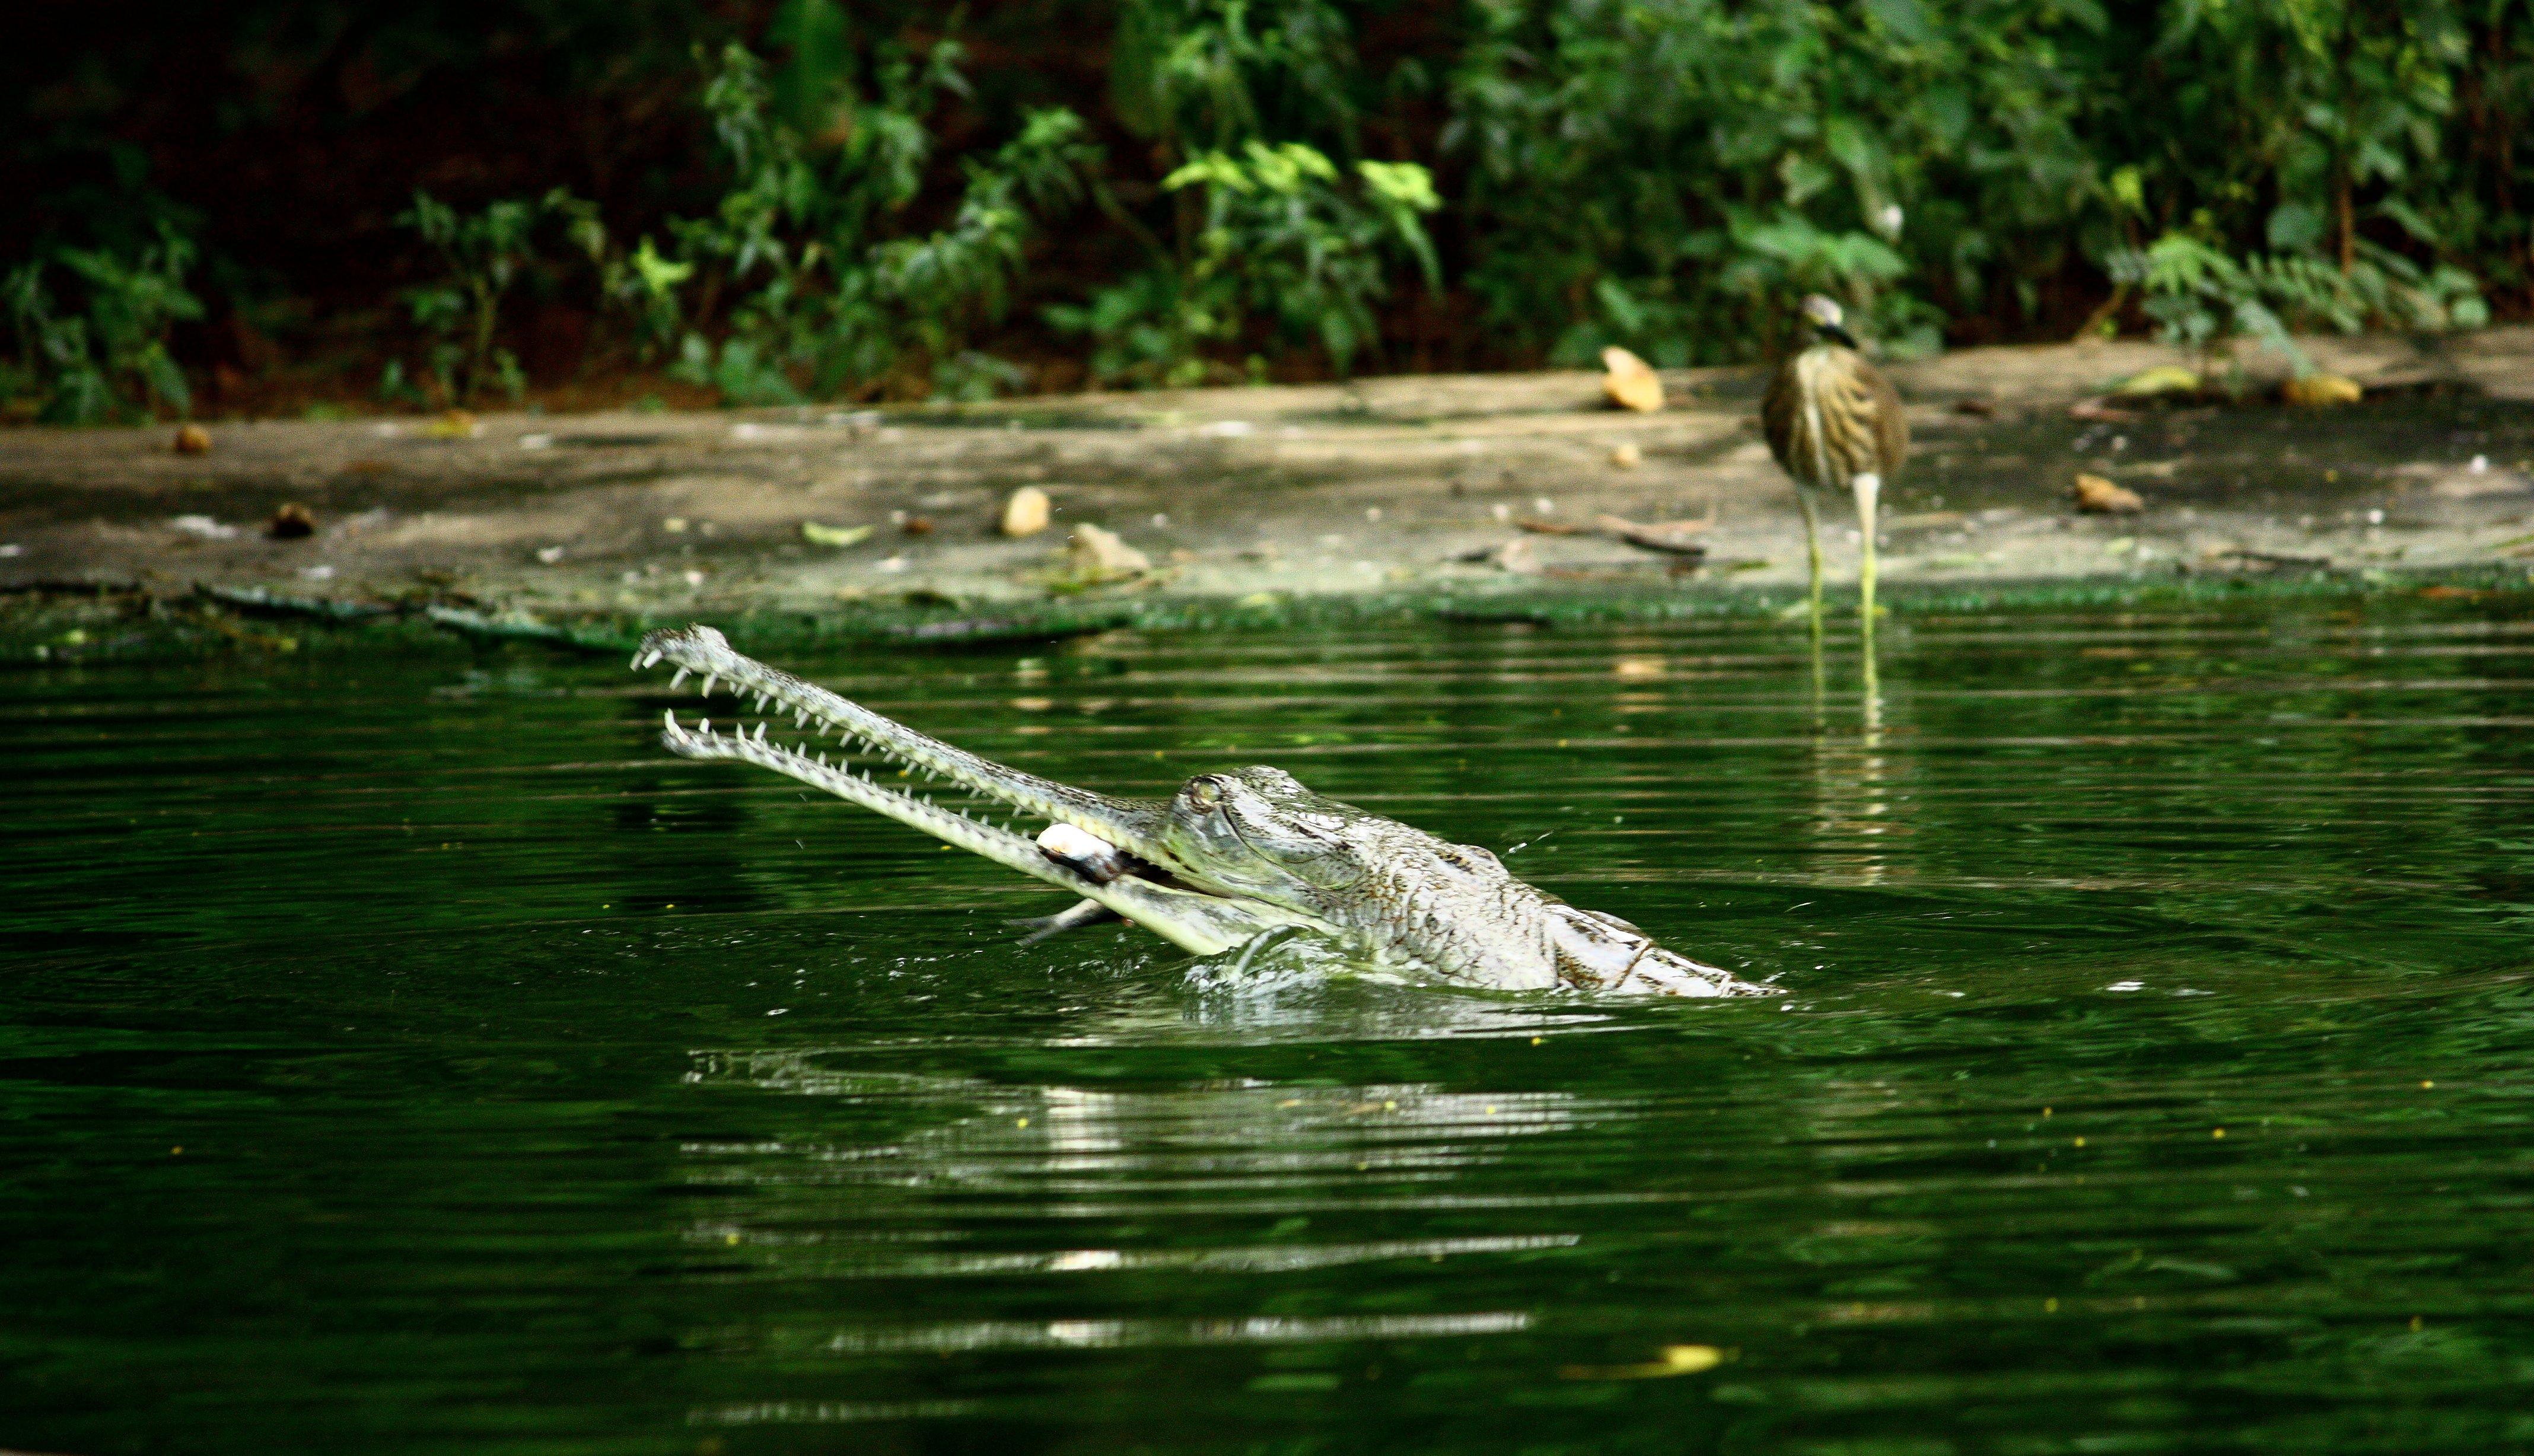 Indira Gandhi National Park Zoo Park Indira Gandhi